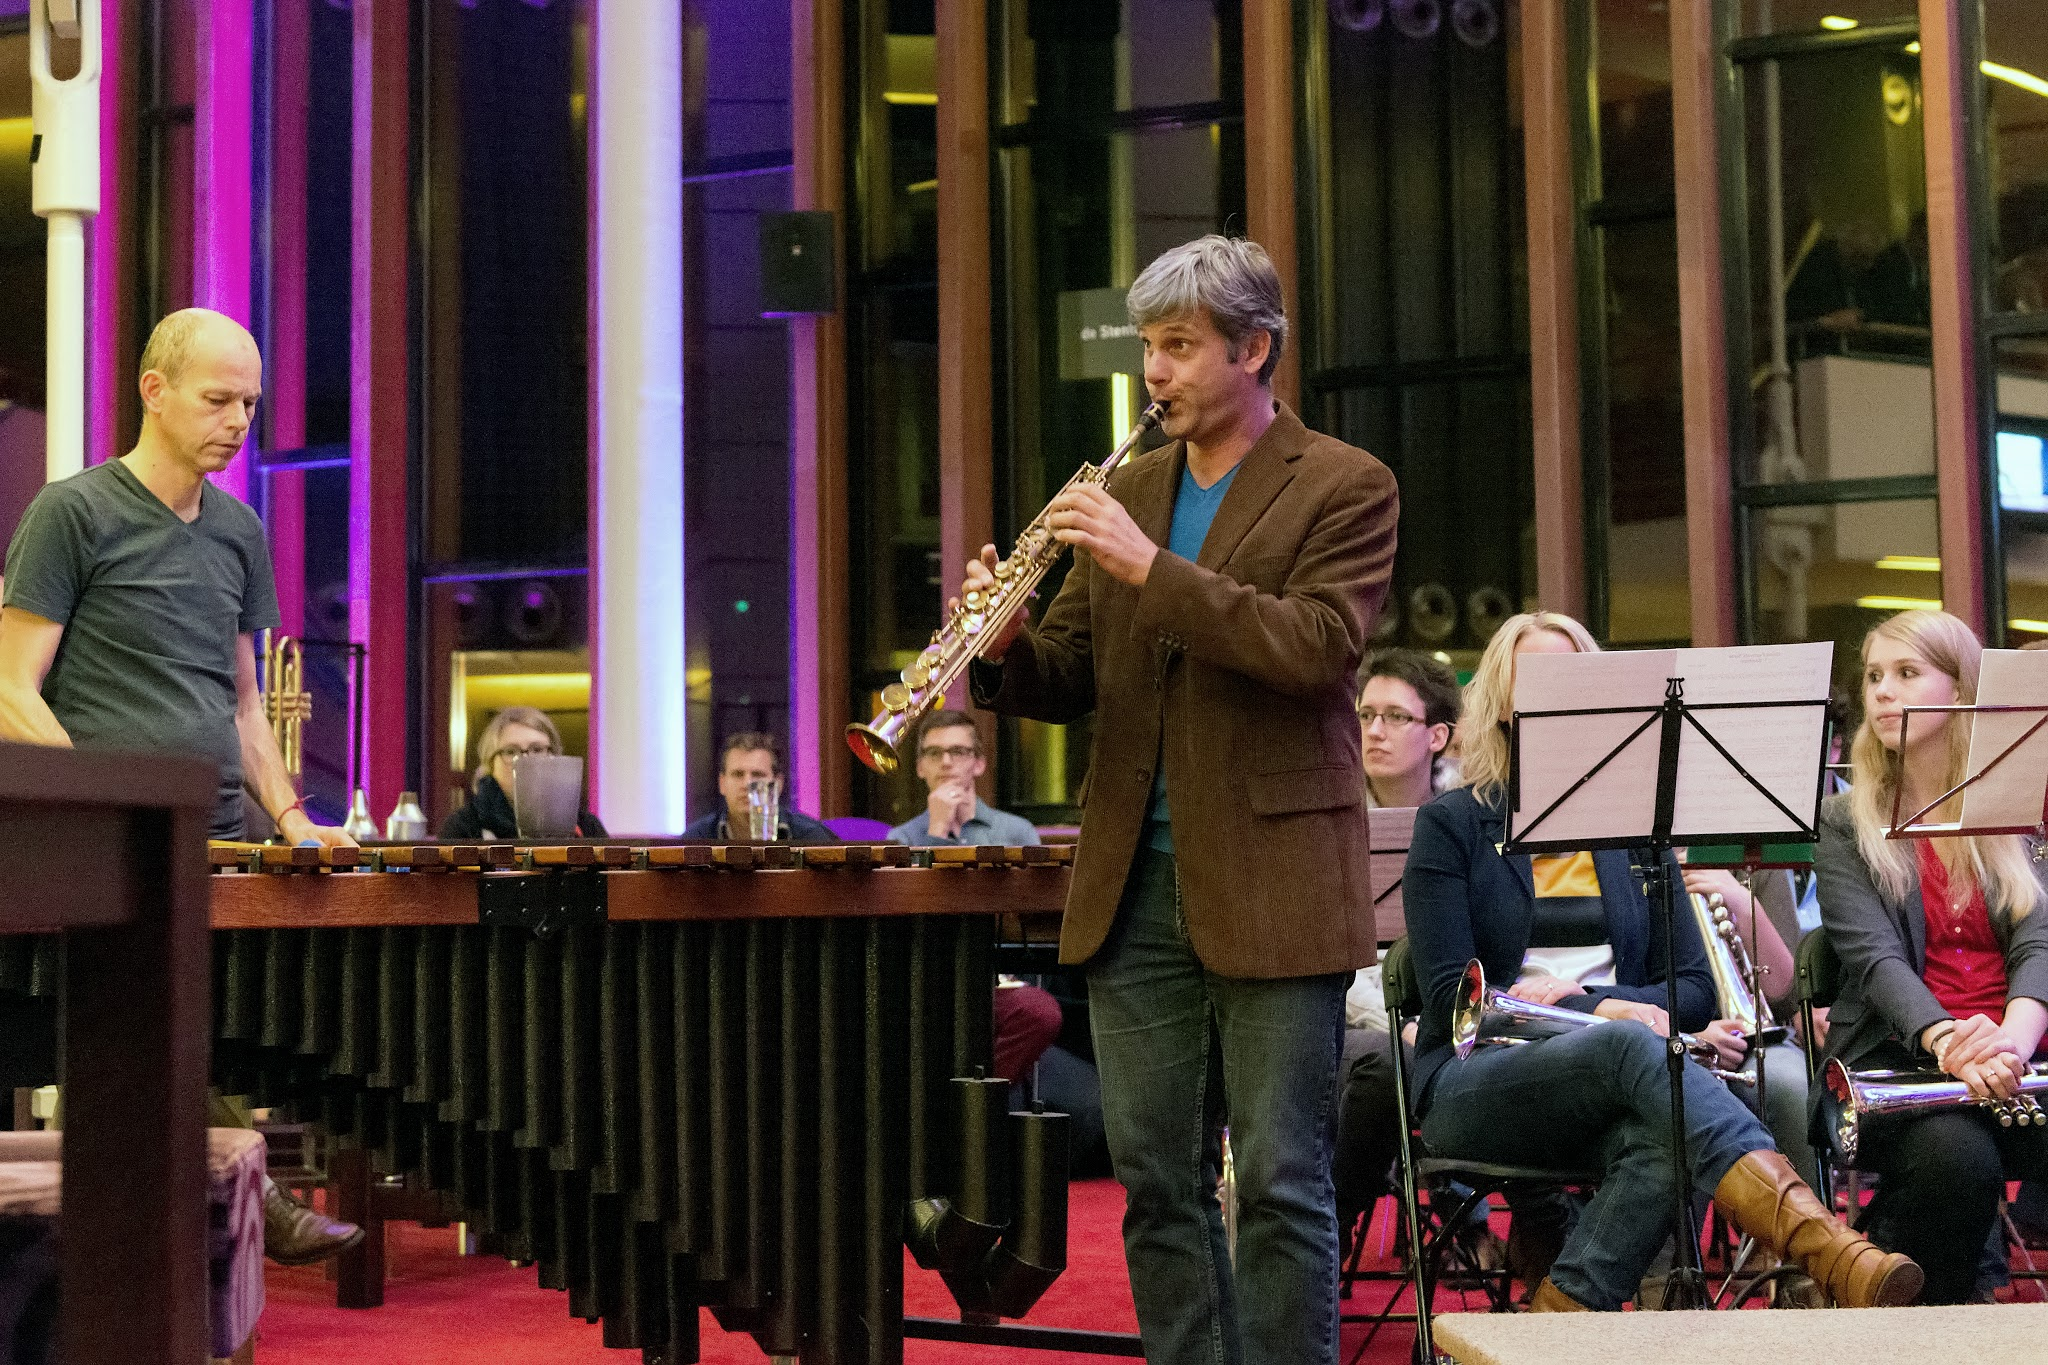 Artes7 Wood Winds concert